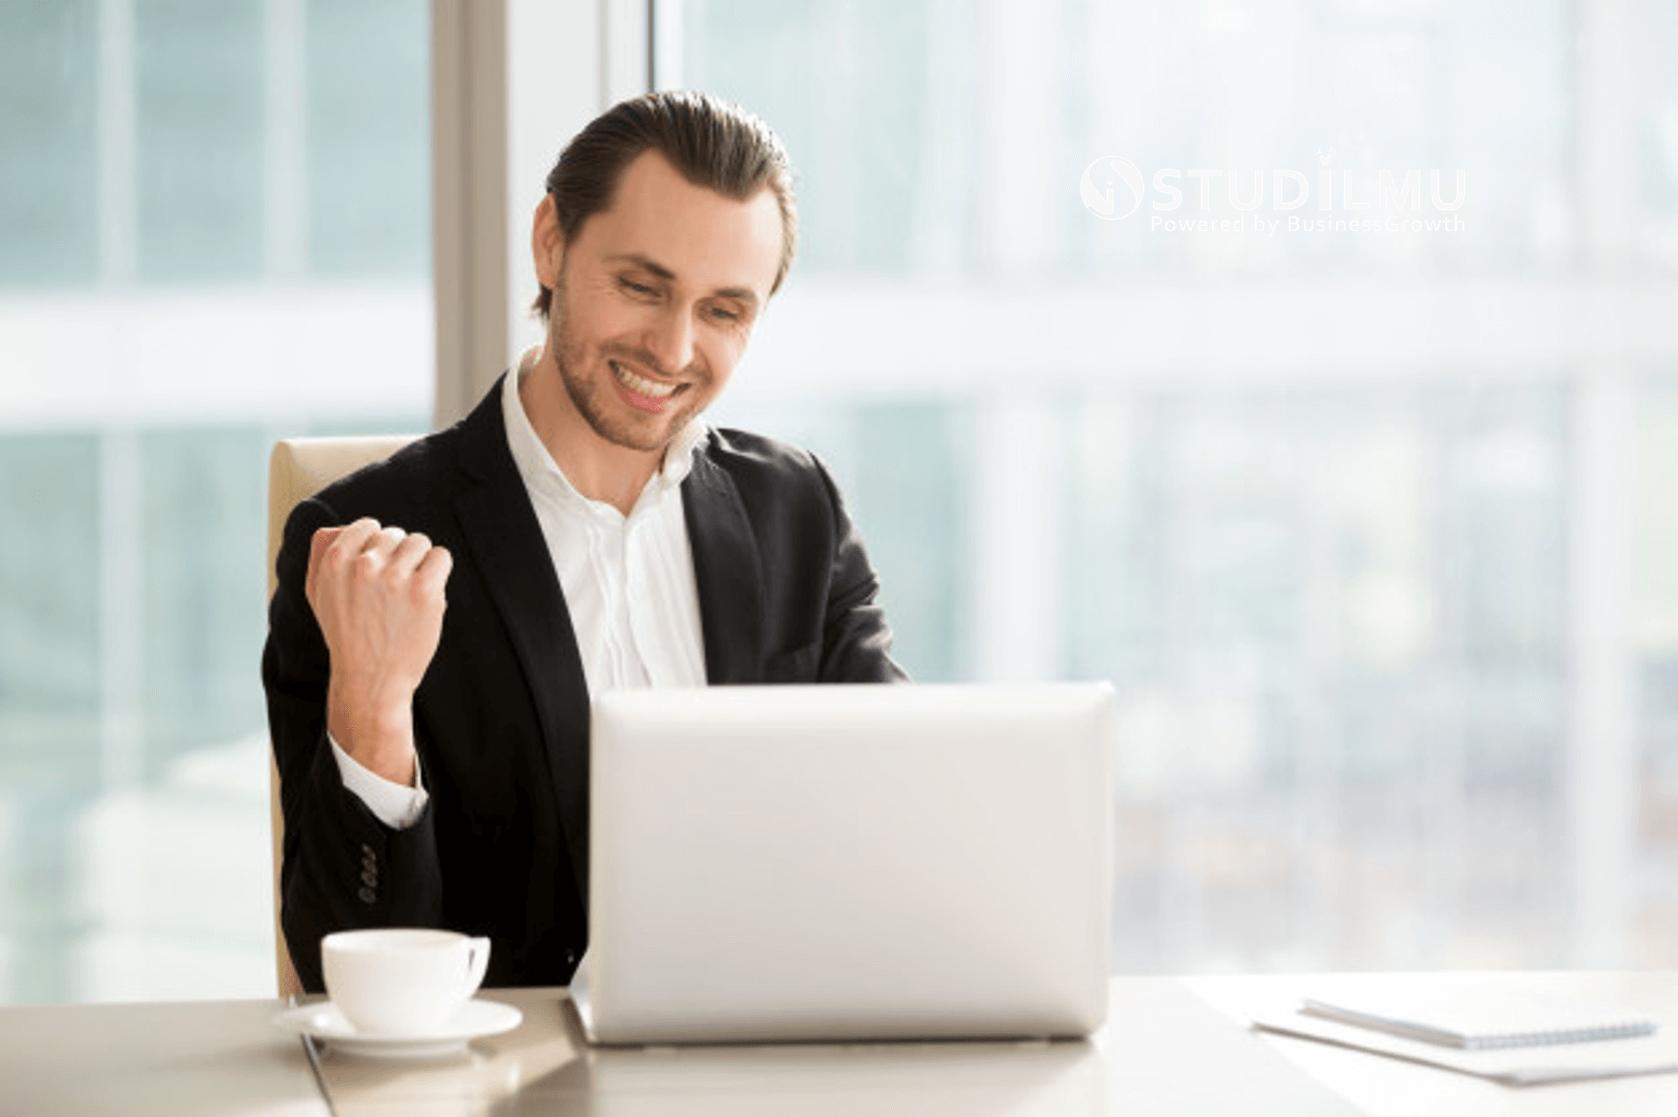 STUDILMU Career Advice - 15 Tanda Anda Luar Biasa